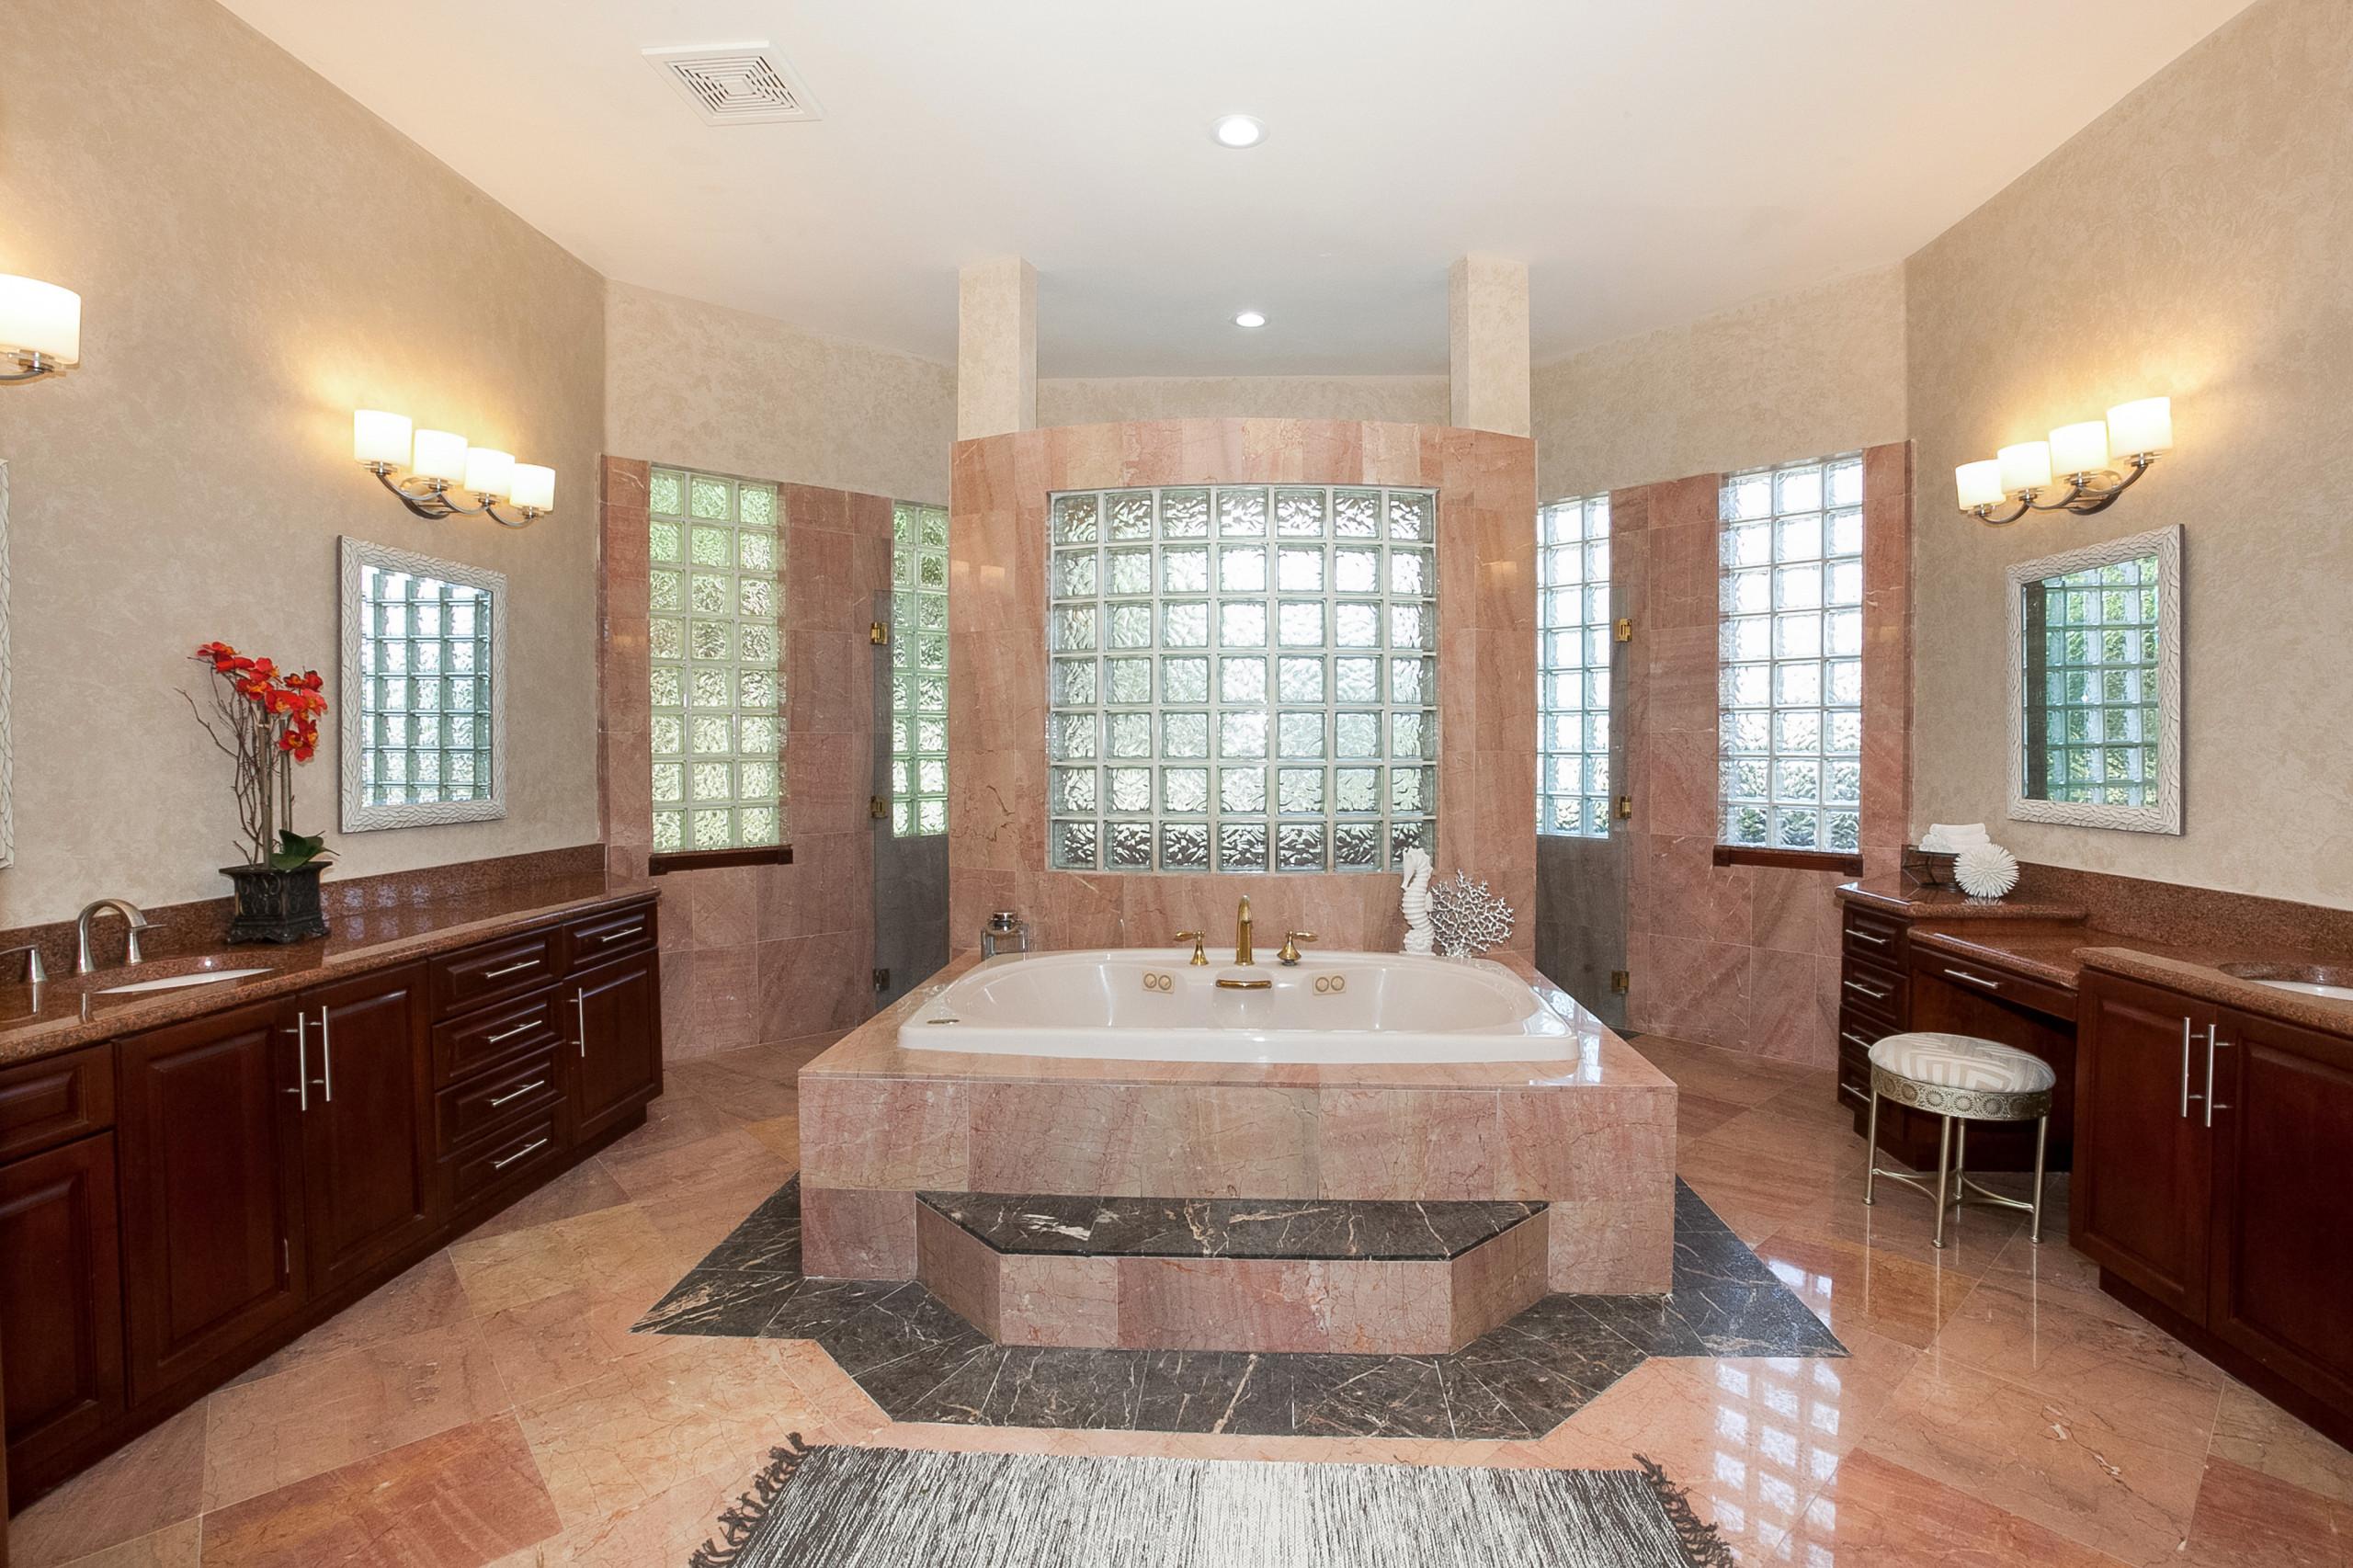 pink tile travertine floor bathroom